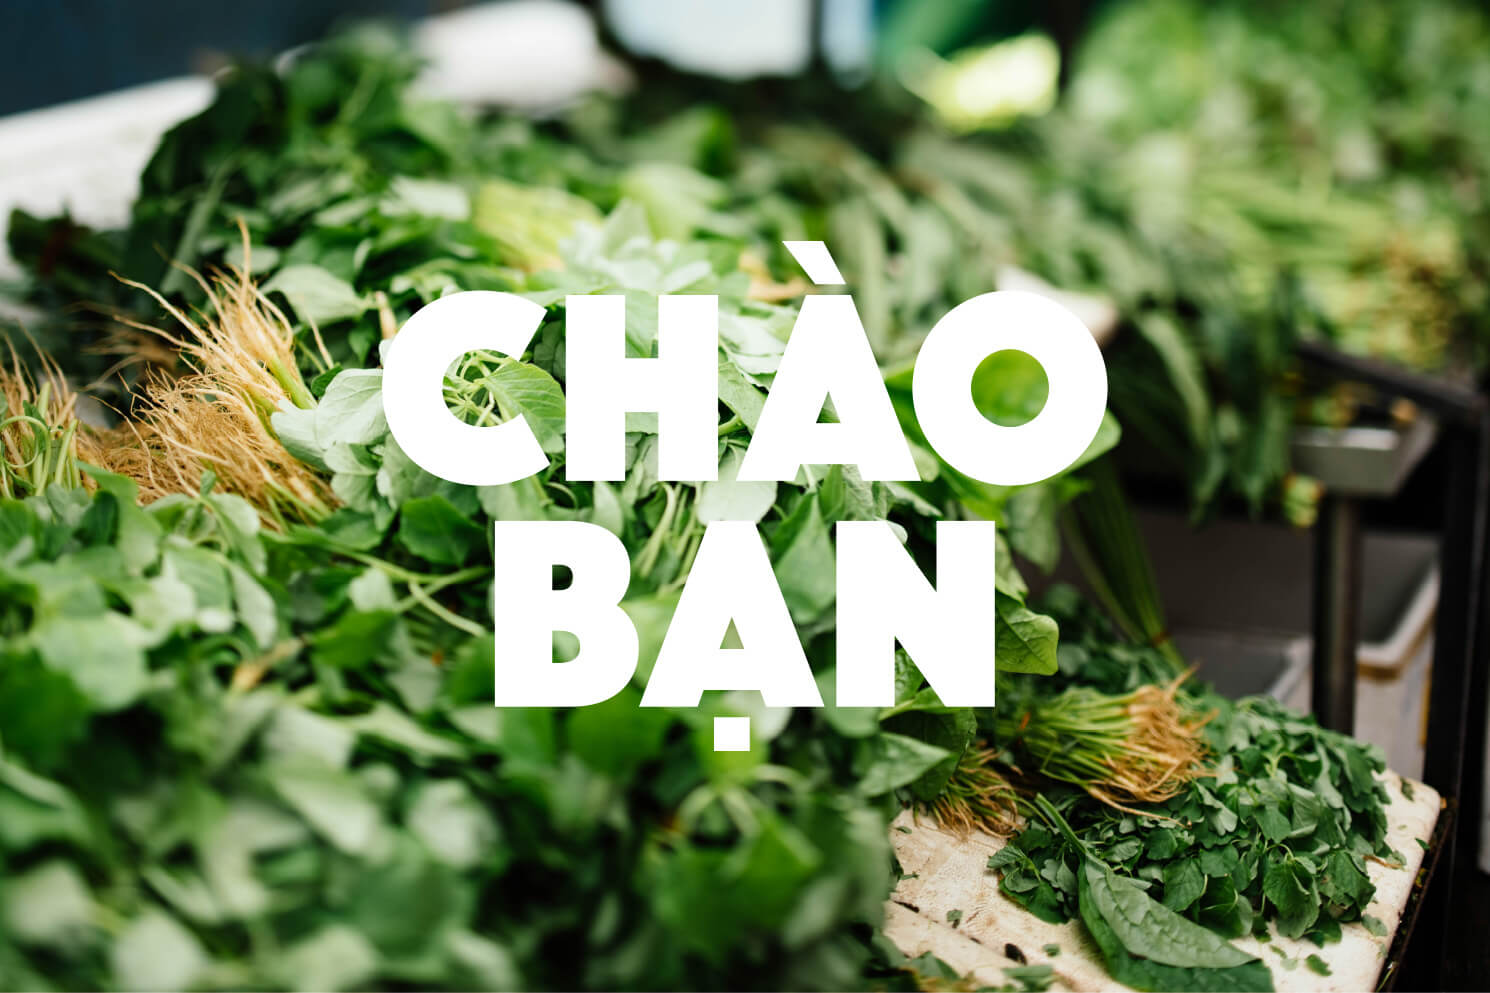 Chao Ban Logotype Herbs